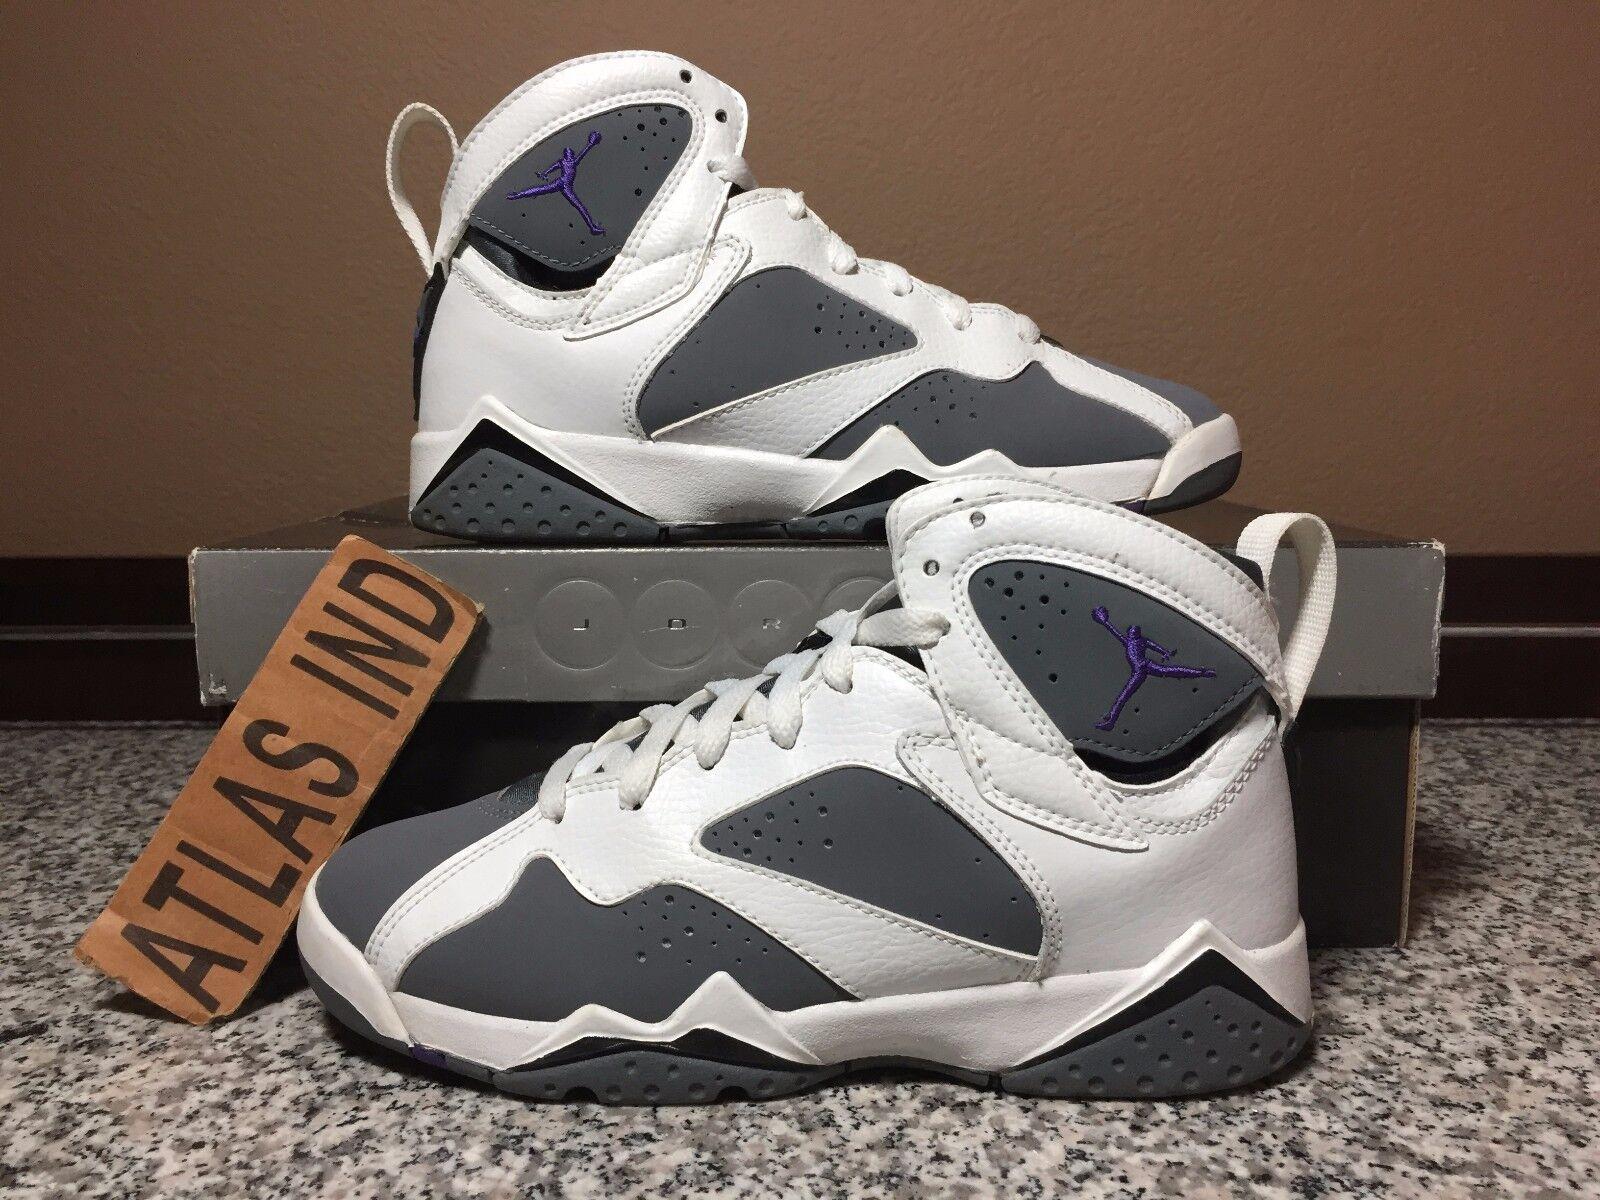 AIR JORDAN 7 RETRO Flint Grey Nike VII 1 3 5 6 8 9 11 12 DB Bordeaux Raptors 4Y